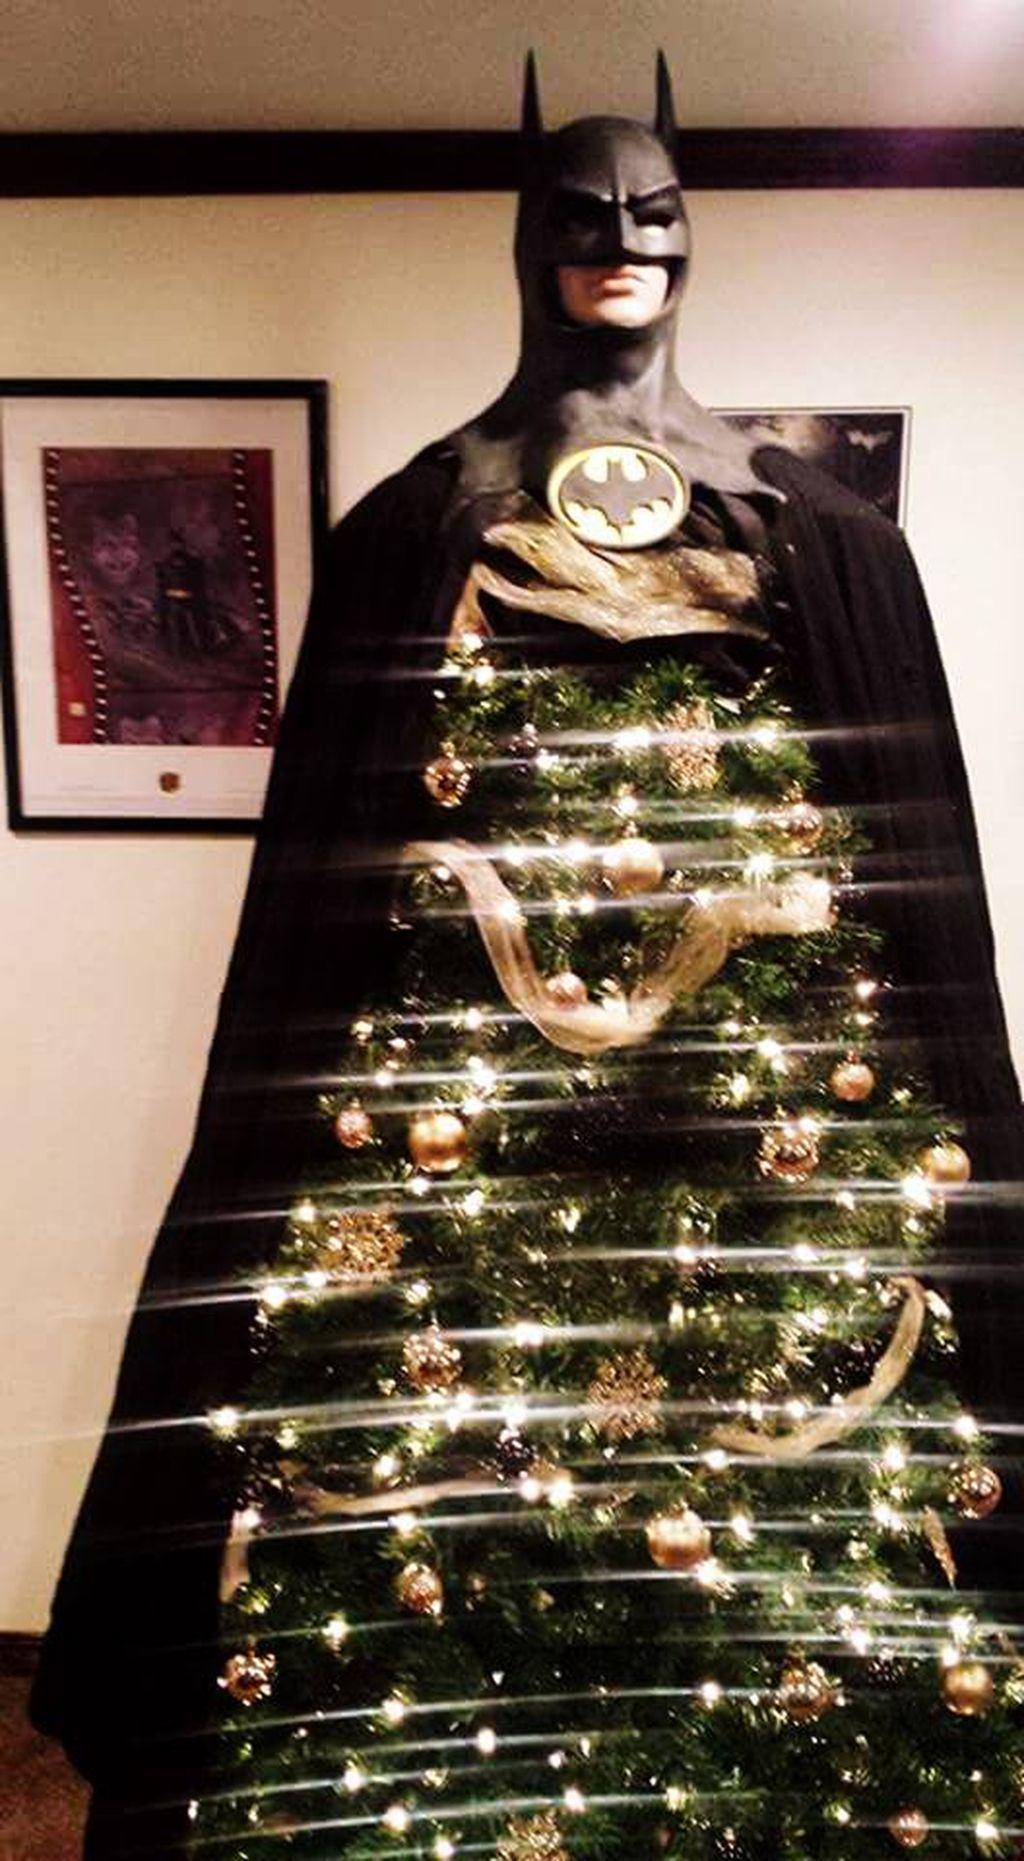 45 Unique And Unusual Black Christmas Tree Decoration Ideas Homedecorish Batman Christmas Tree Black Christmas Tree Decorations Christmas Trees For Kids